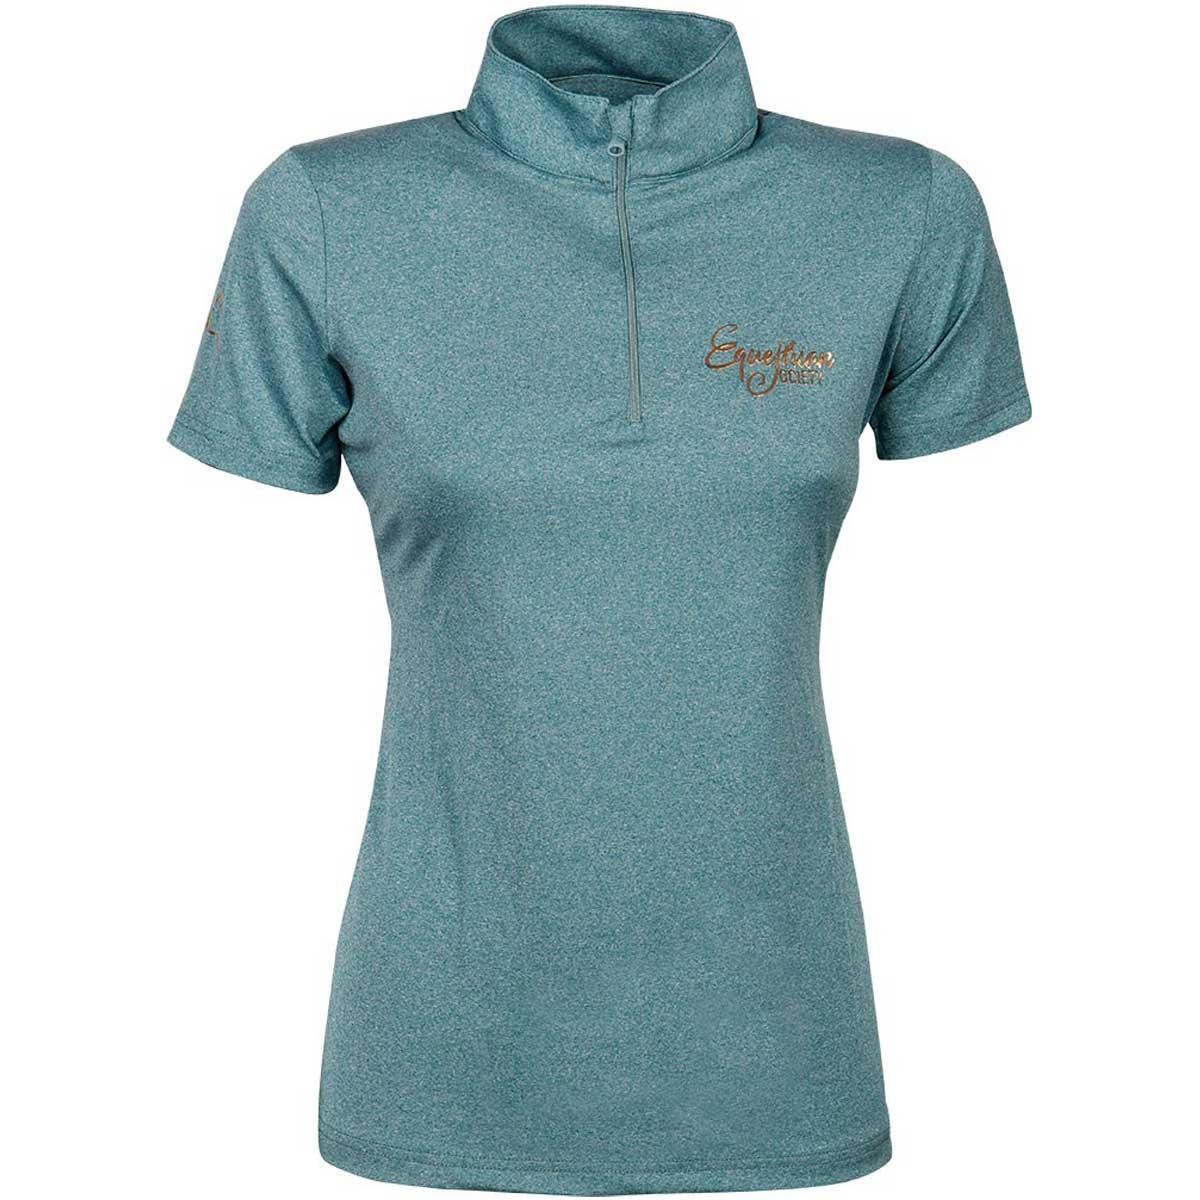 Harry's Horse Harding Techshirt groen maat:s